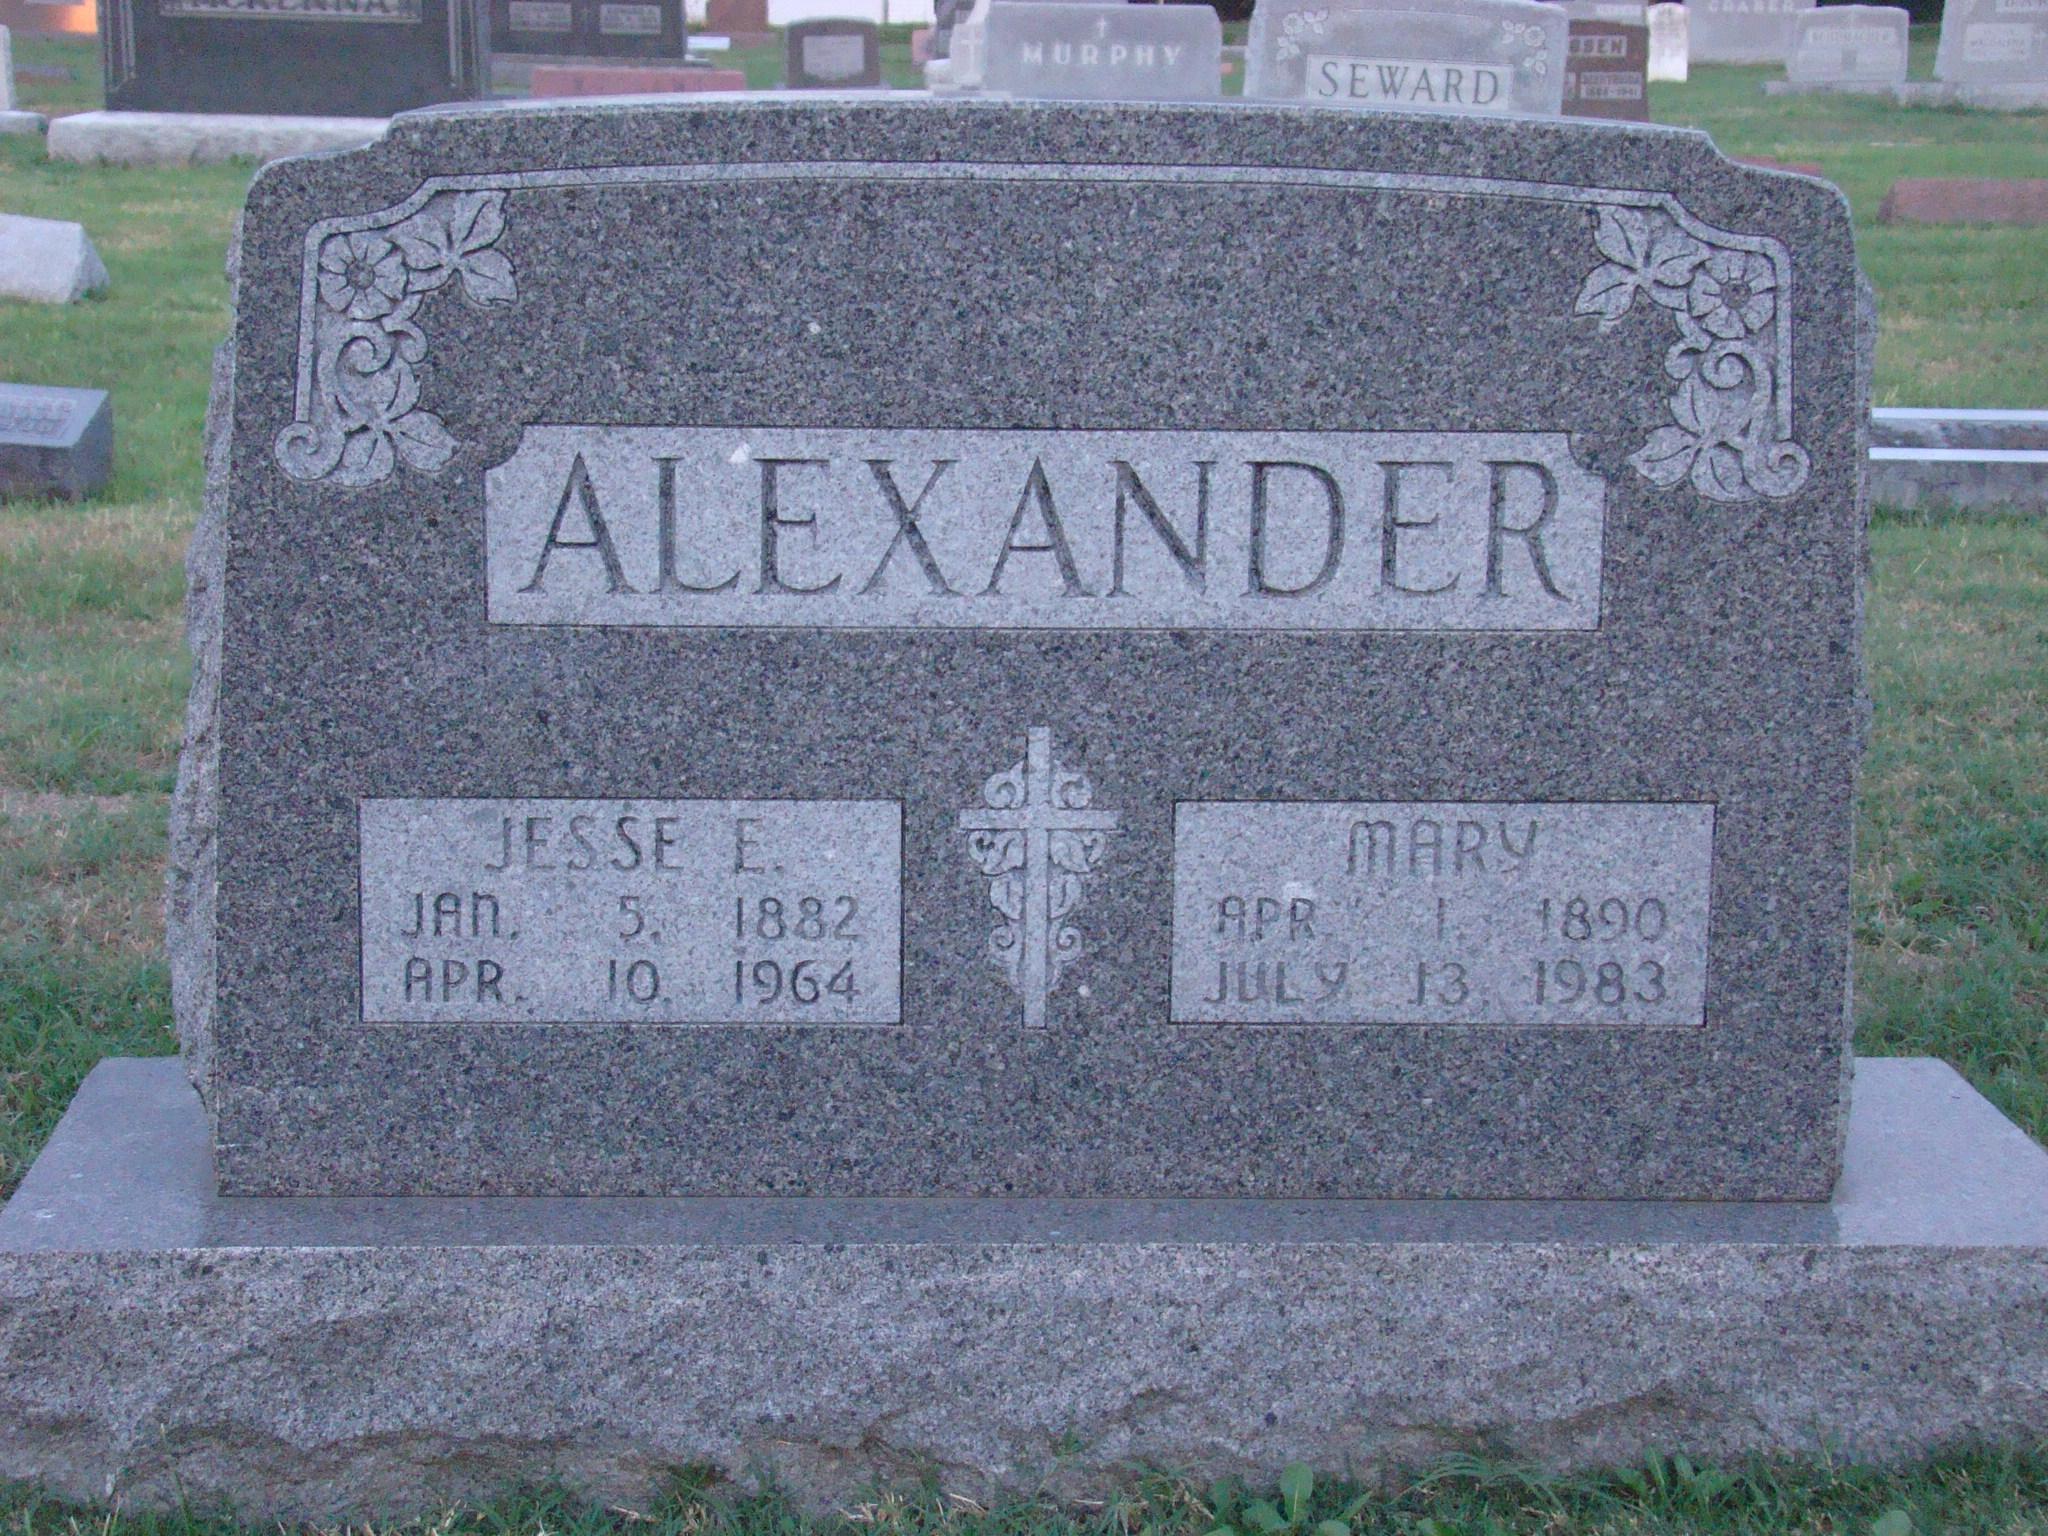 Jesse Edward Alexander